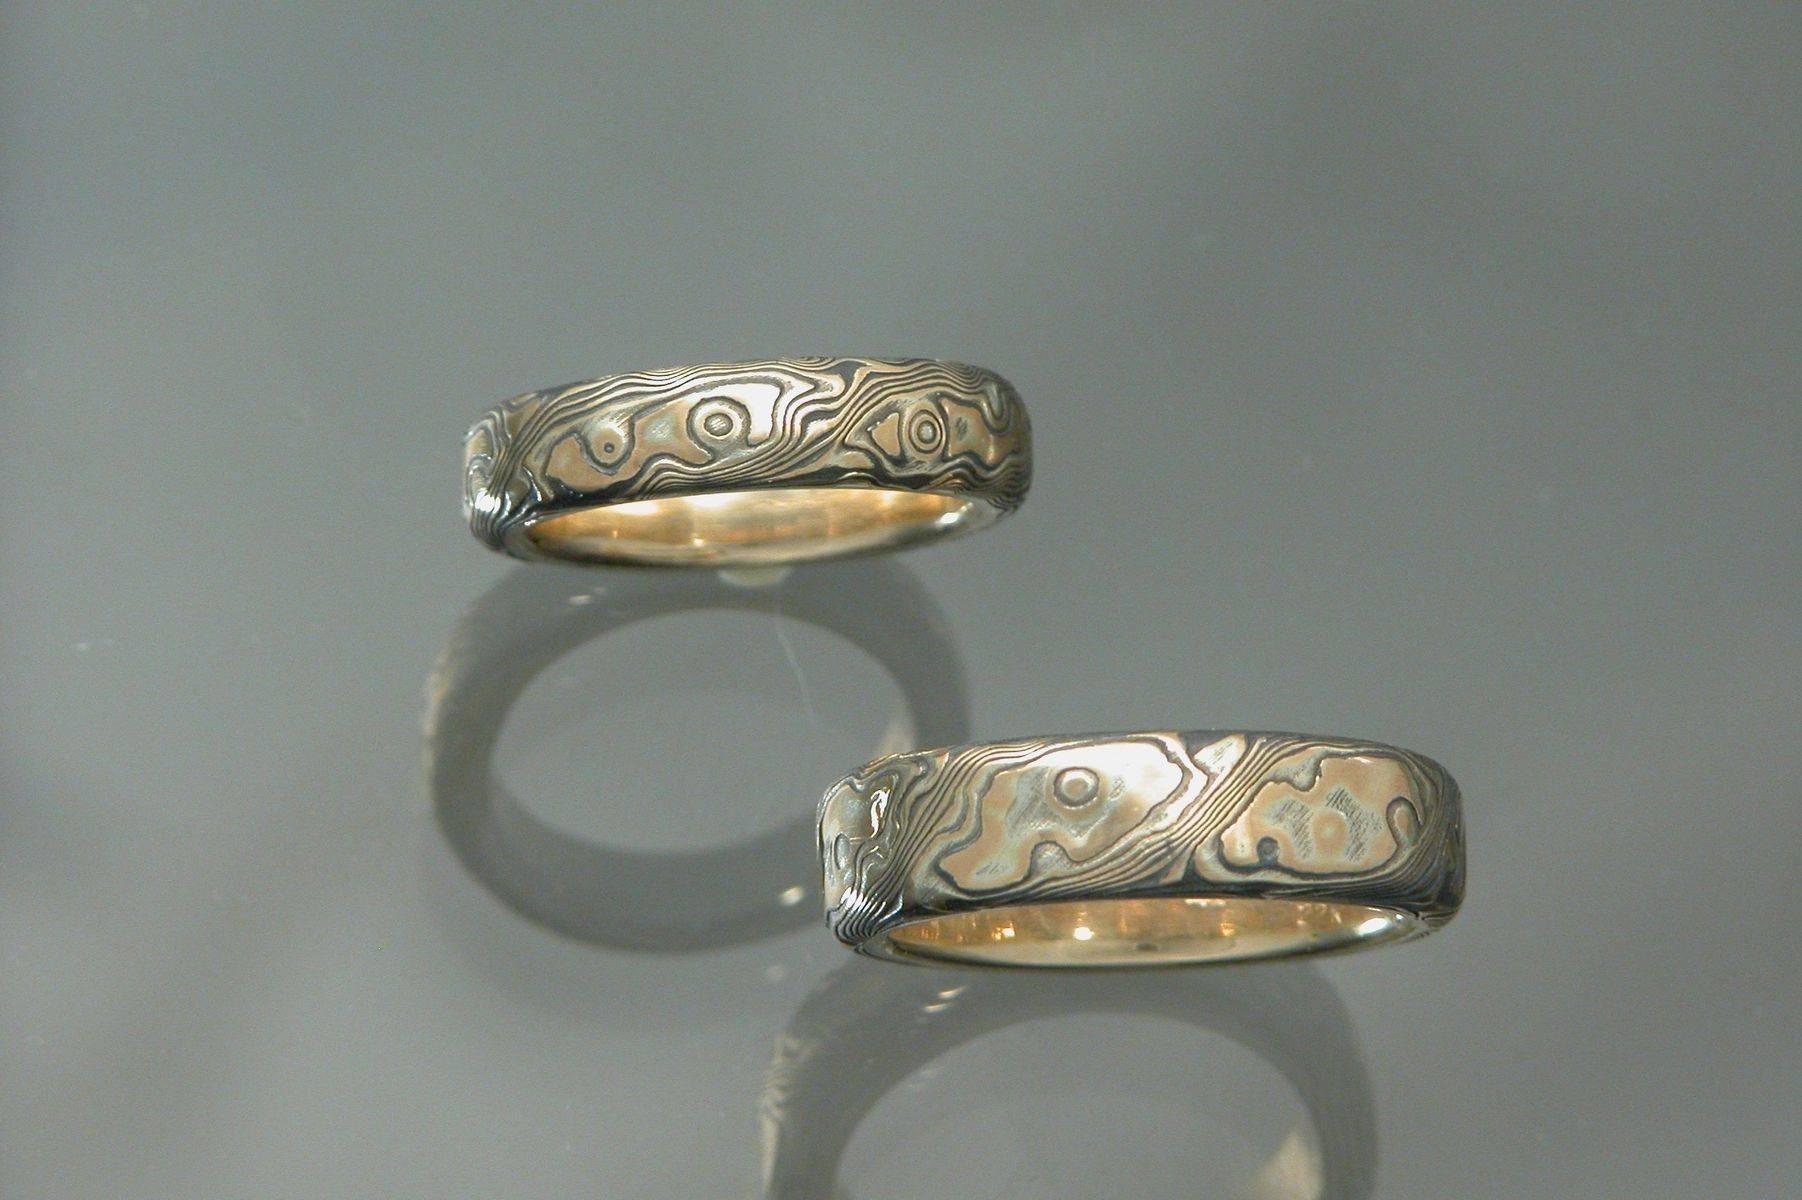 Mokume Gane Rings | Mokume Wedding Bands And Engagement Rings Regarding Mokume Gane Wedding Bands (View 2 of 15)